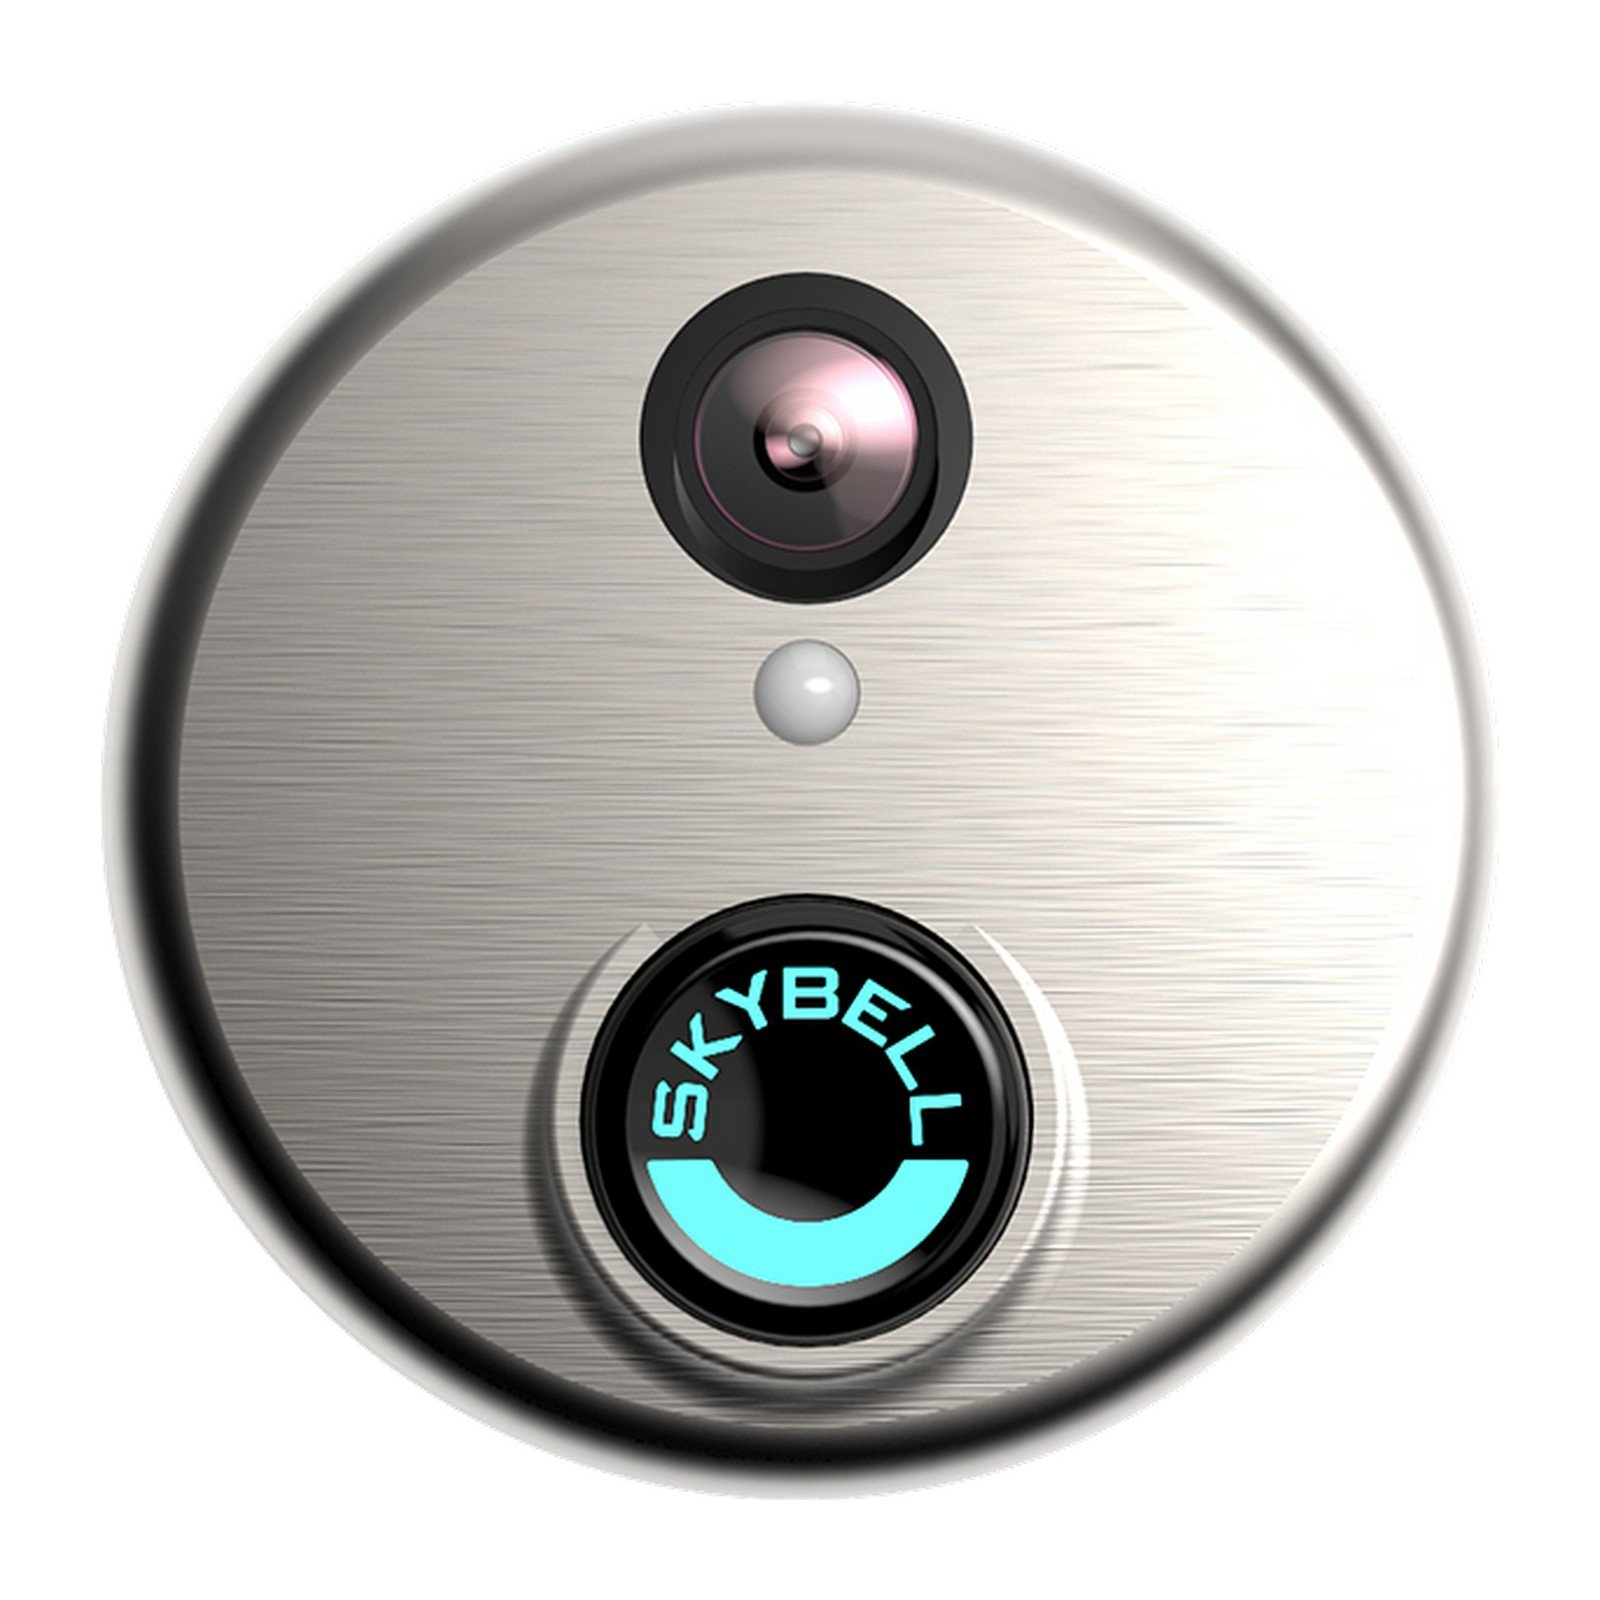 SkyBell PP02301SL | HD Wi-Fi Video Doorbell Silver